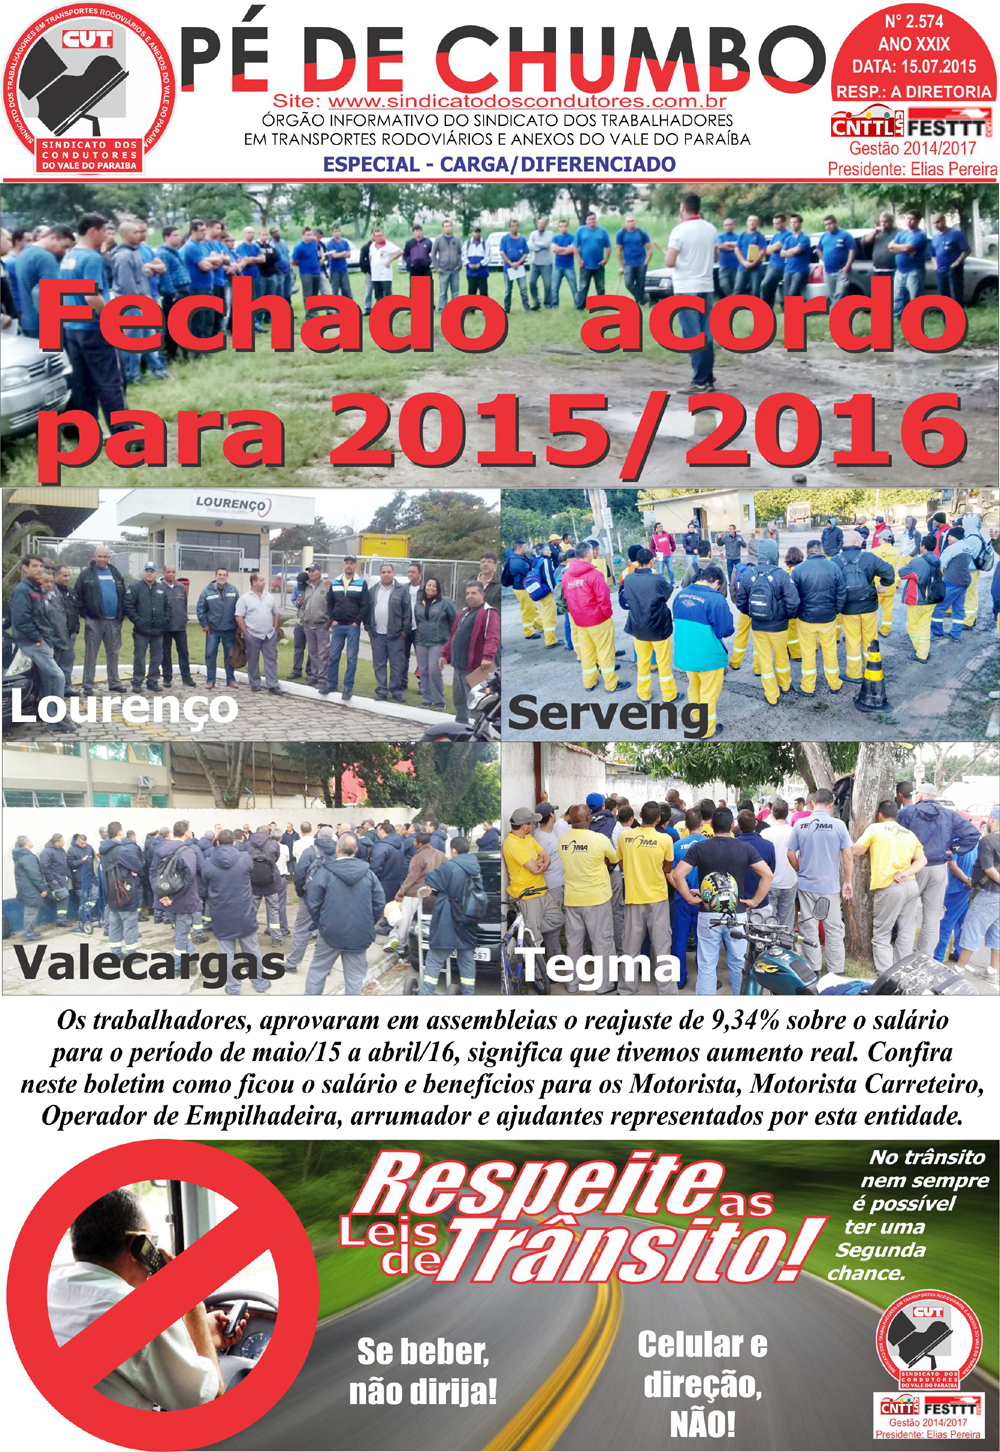 Boletim - Pé de Chumbo - 15/07/2015